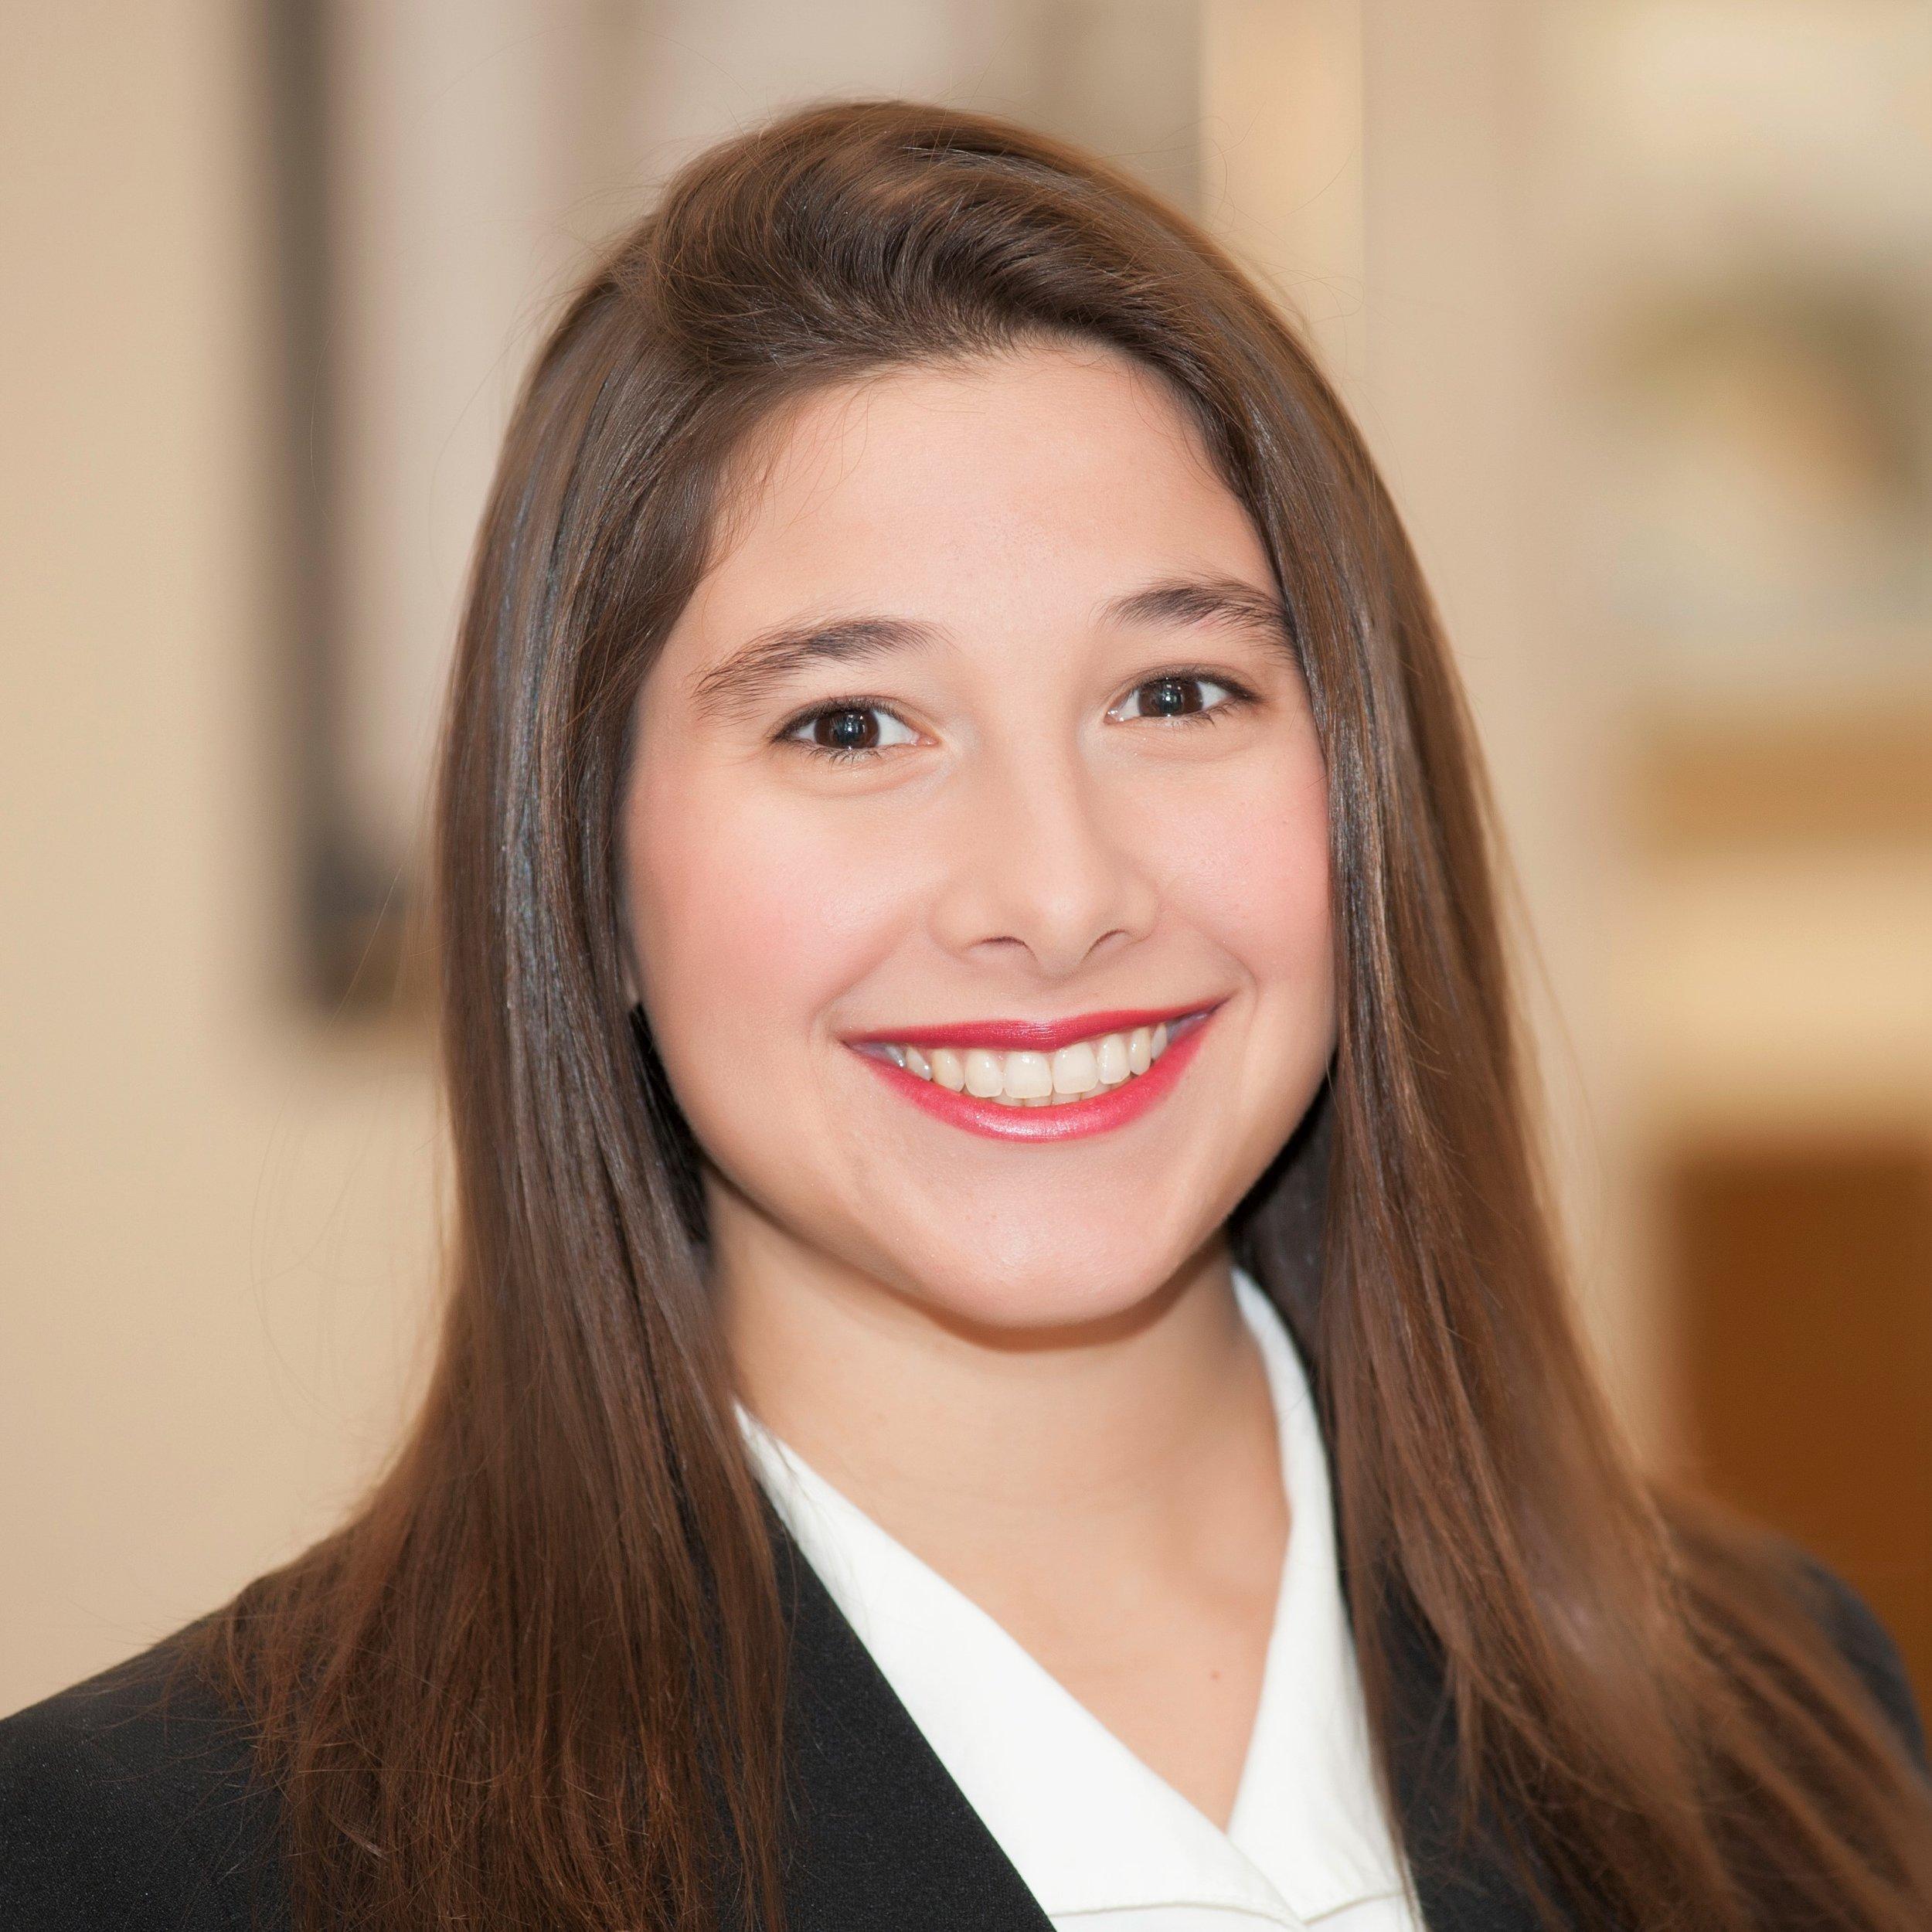 ann-arbor-Michigan-lawyer.jpg